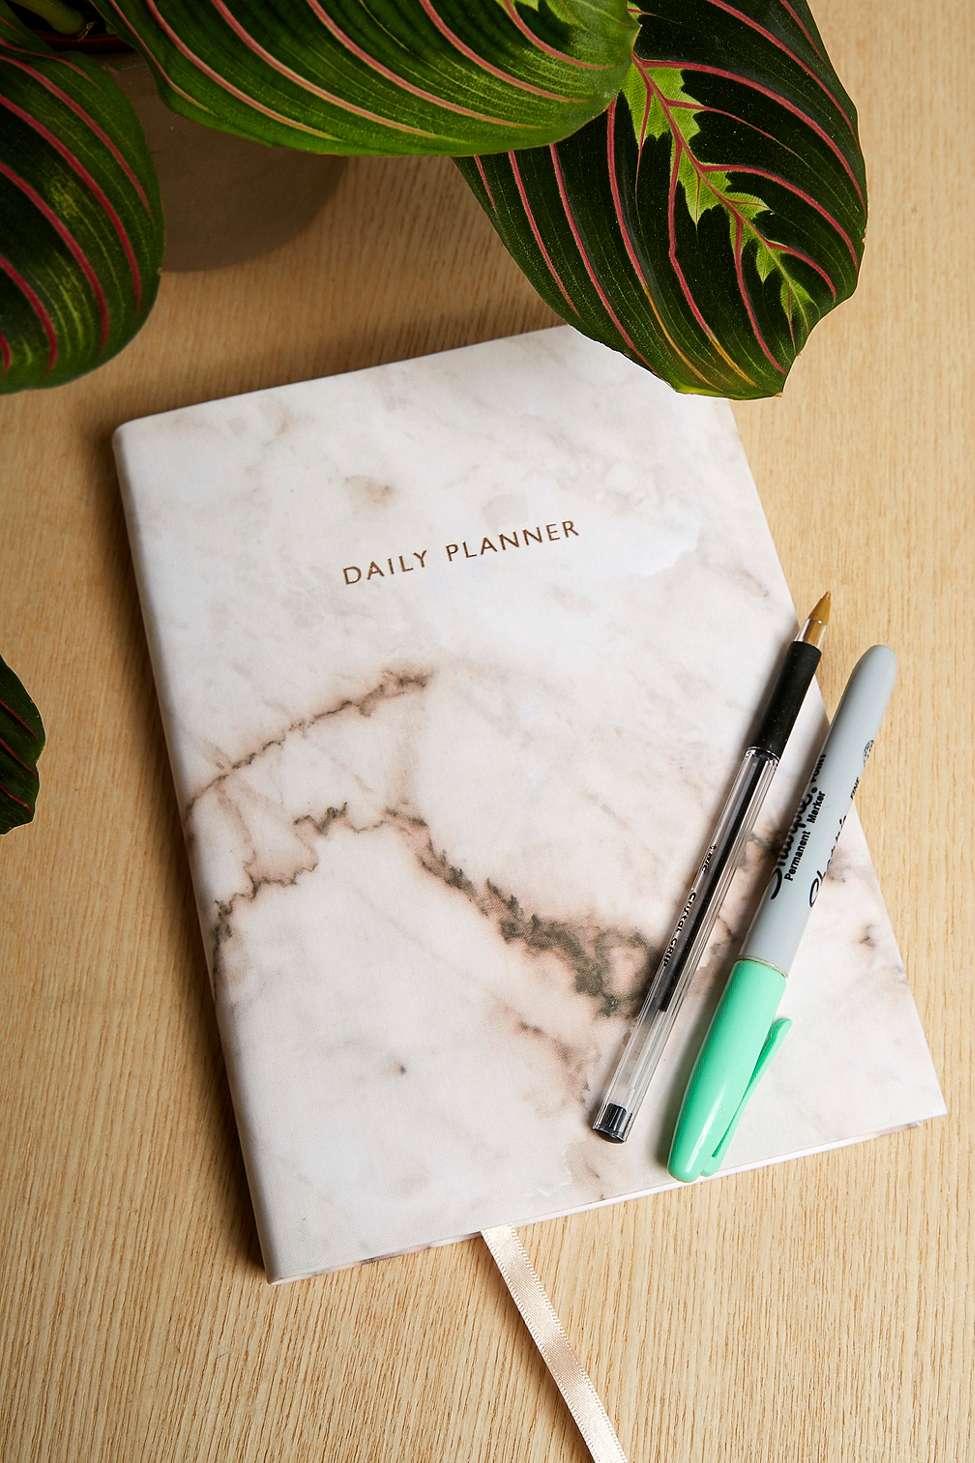 Slide View: 1: Ohh Deer Marble Rose Daily Planner